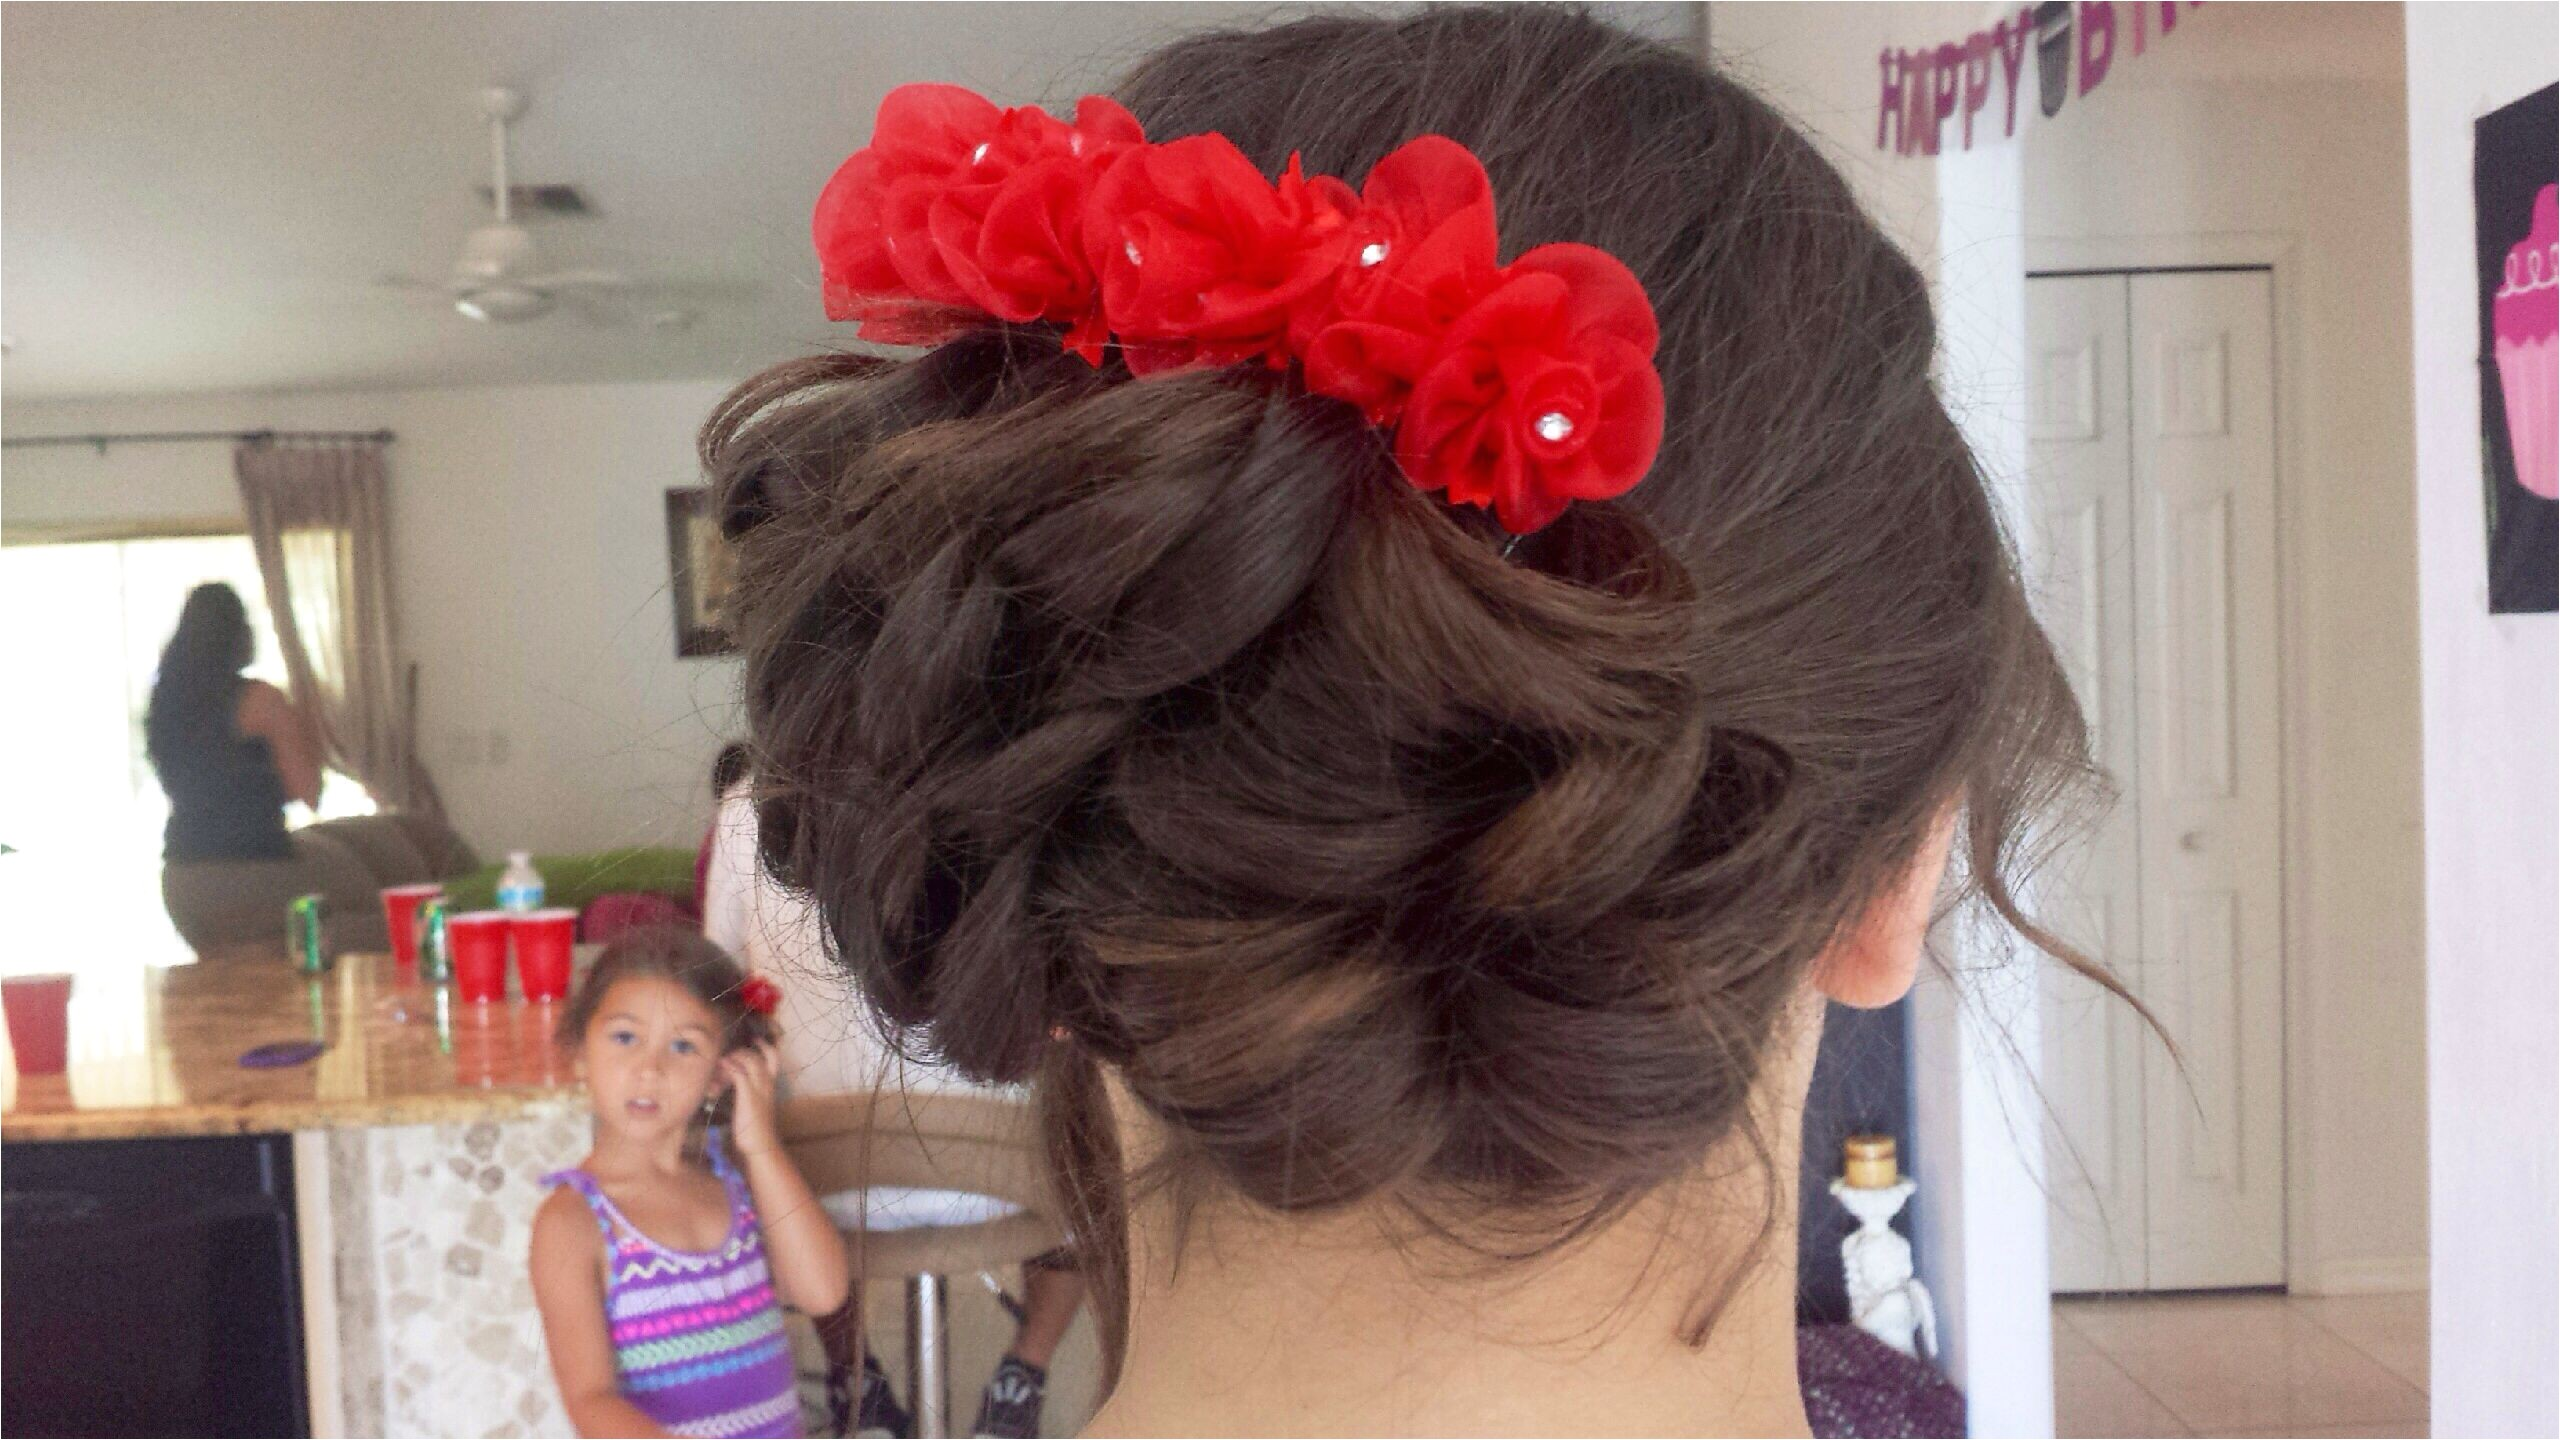 Wedding Hair for Flower Girl Luxury Flower Girl Hair Brown Hair Curly Updo Wedding Flowers